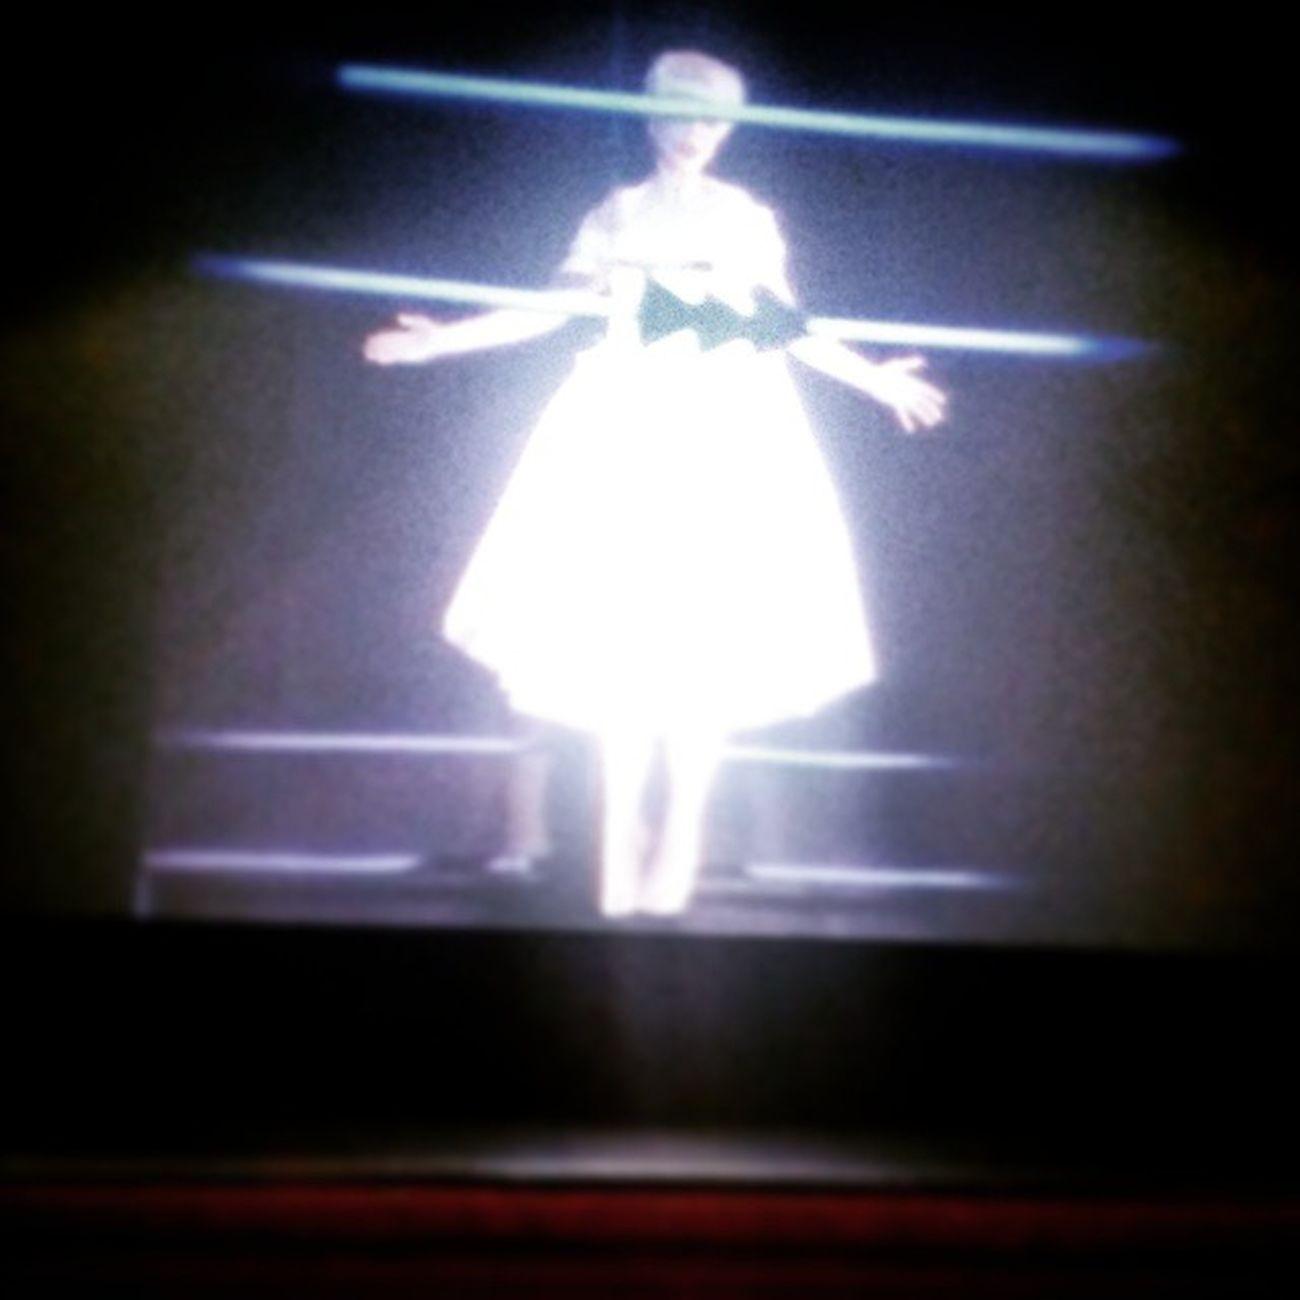 Laurapalmer Intothenight Cambridge Brattletheater DavidLynch Angel